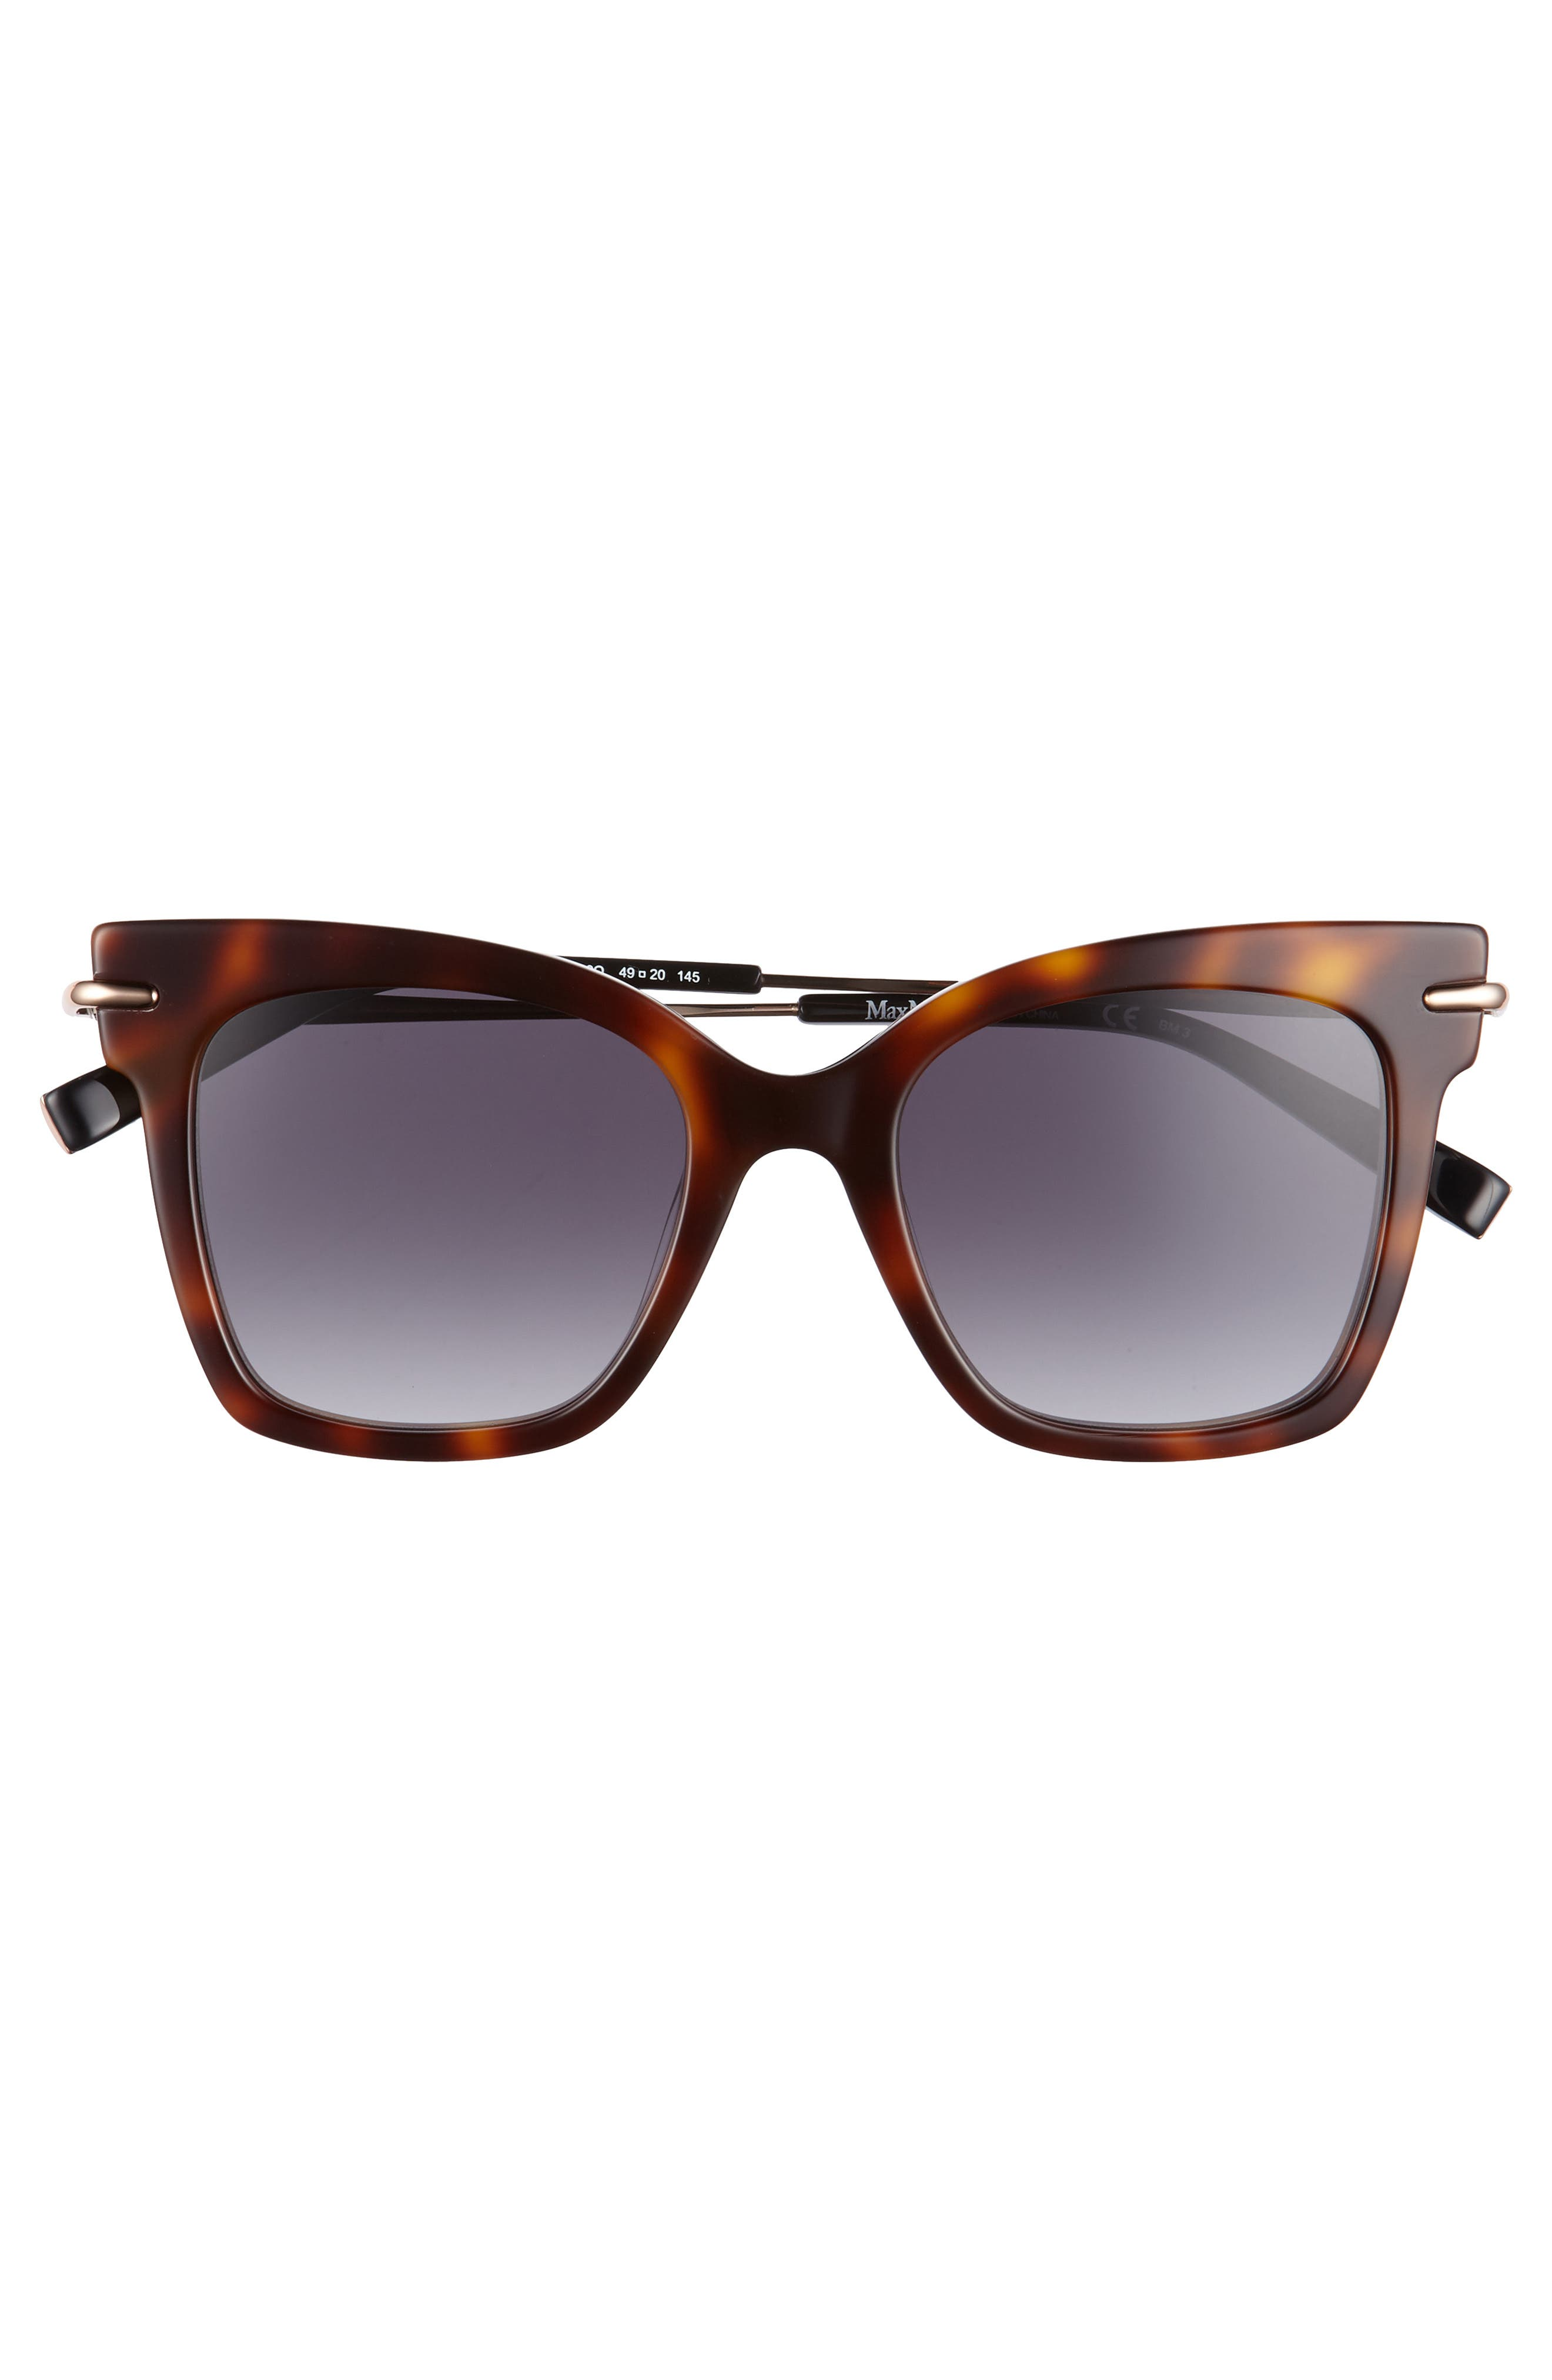 Needliv 49mm Gradient Cat Eye Sunglasses,                             Alternate thumbnail 3, color,                             001